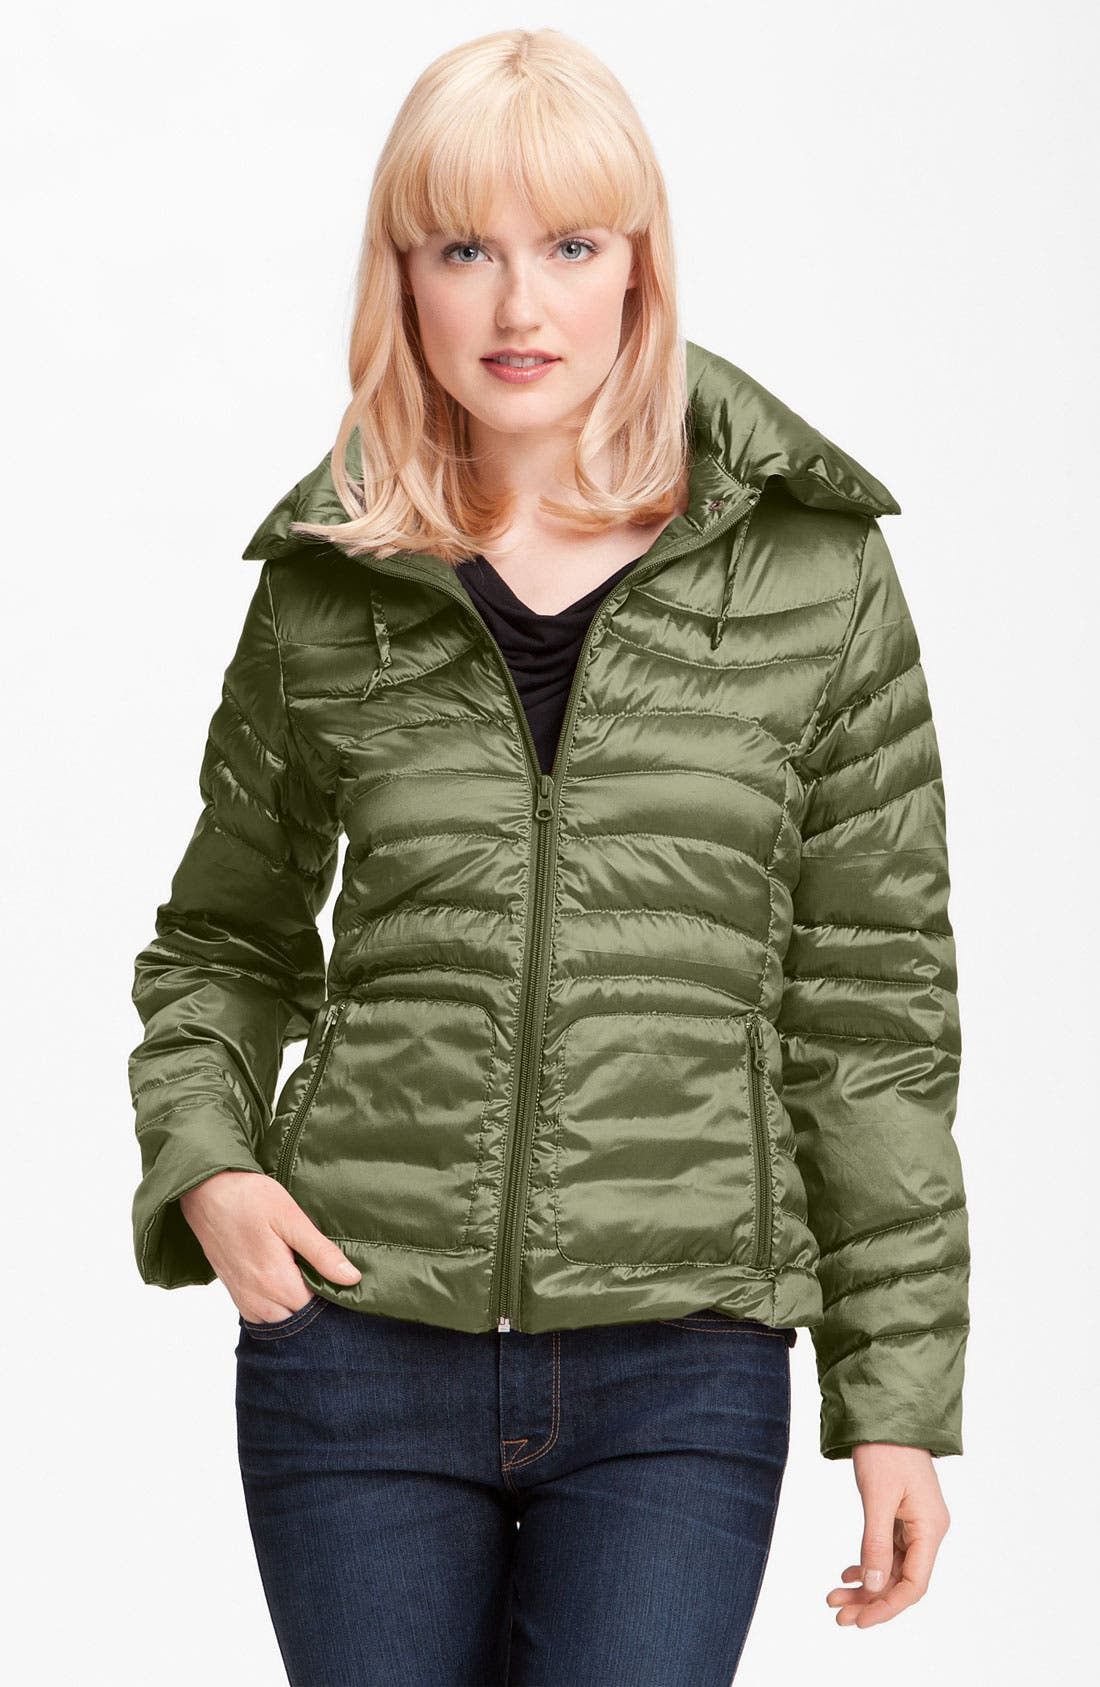 Alternate Image 1 Selected - Bernardo Iridescent Packable Down Jacket